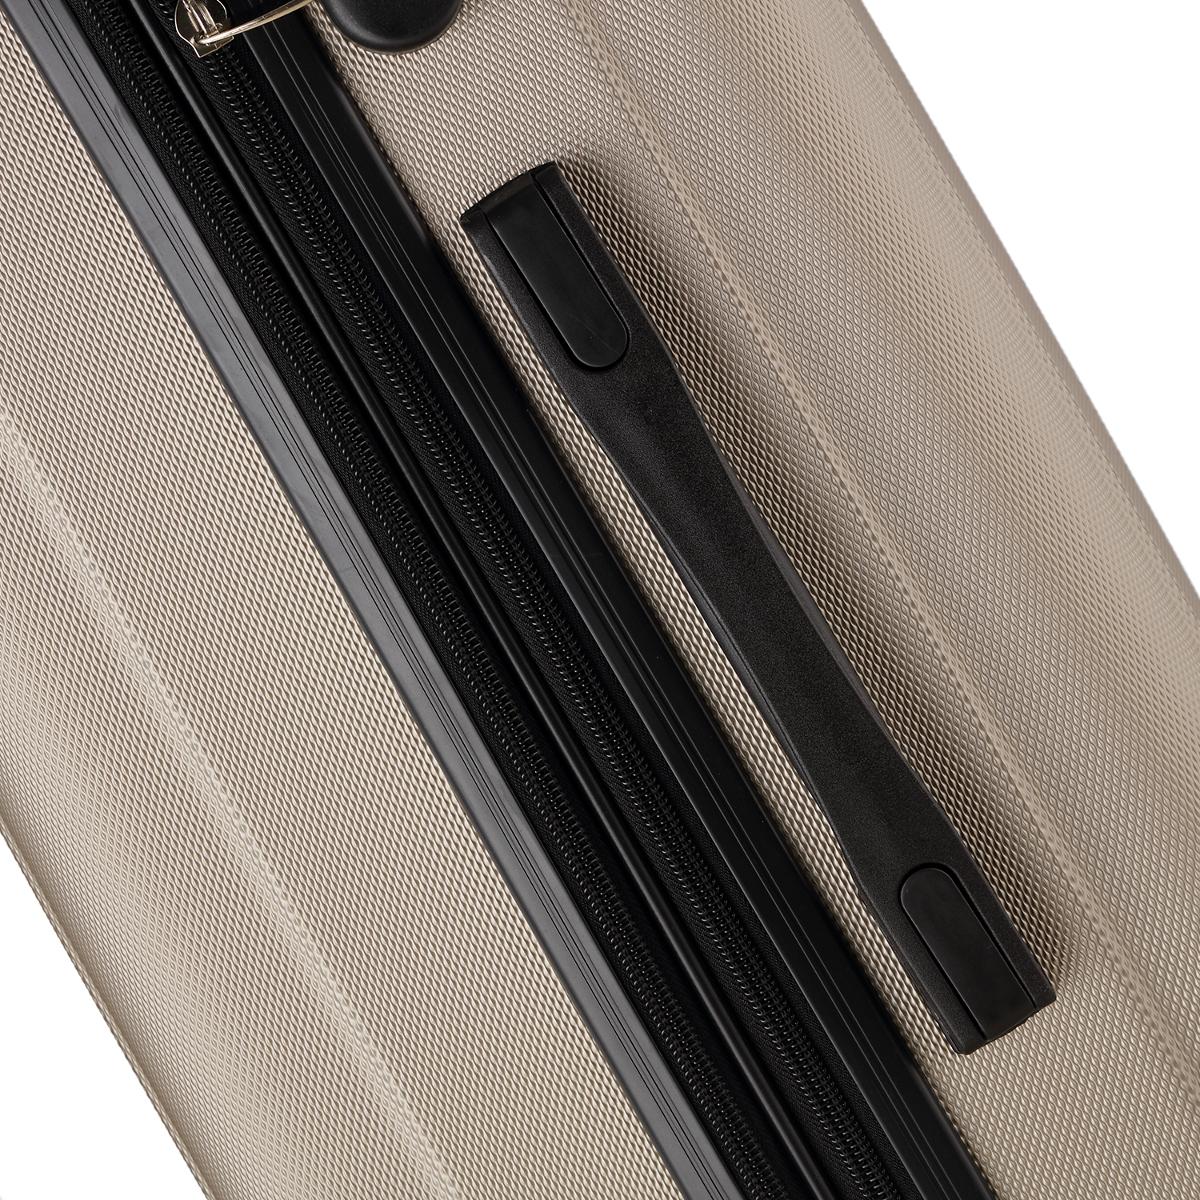 Koffer-Flexot-2045-Hartschalenkoffer-Trolley-Kofferset-Reisekoffer-M-L-XL-Set Indexbild 53